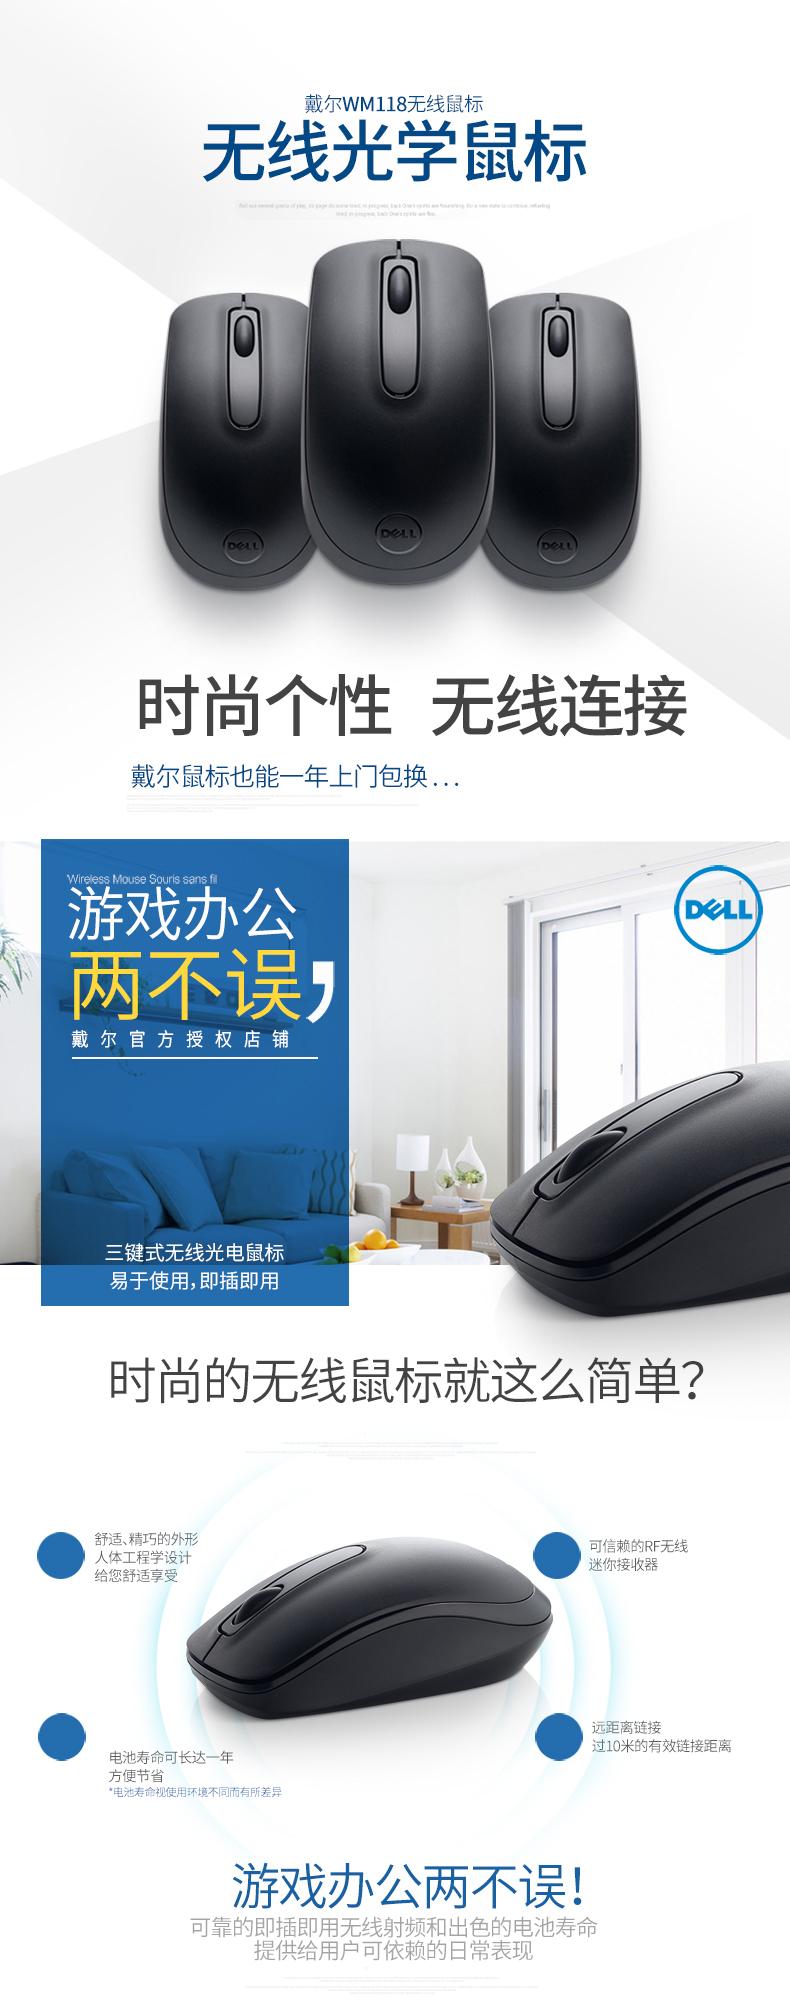 Dell Original Wireless Mouse Laptop Desktop Office Home Small Optical Wm126 Description Feedback Similar Products